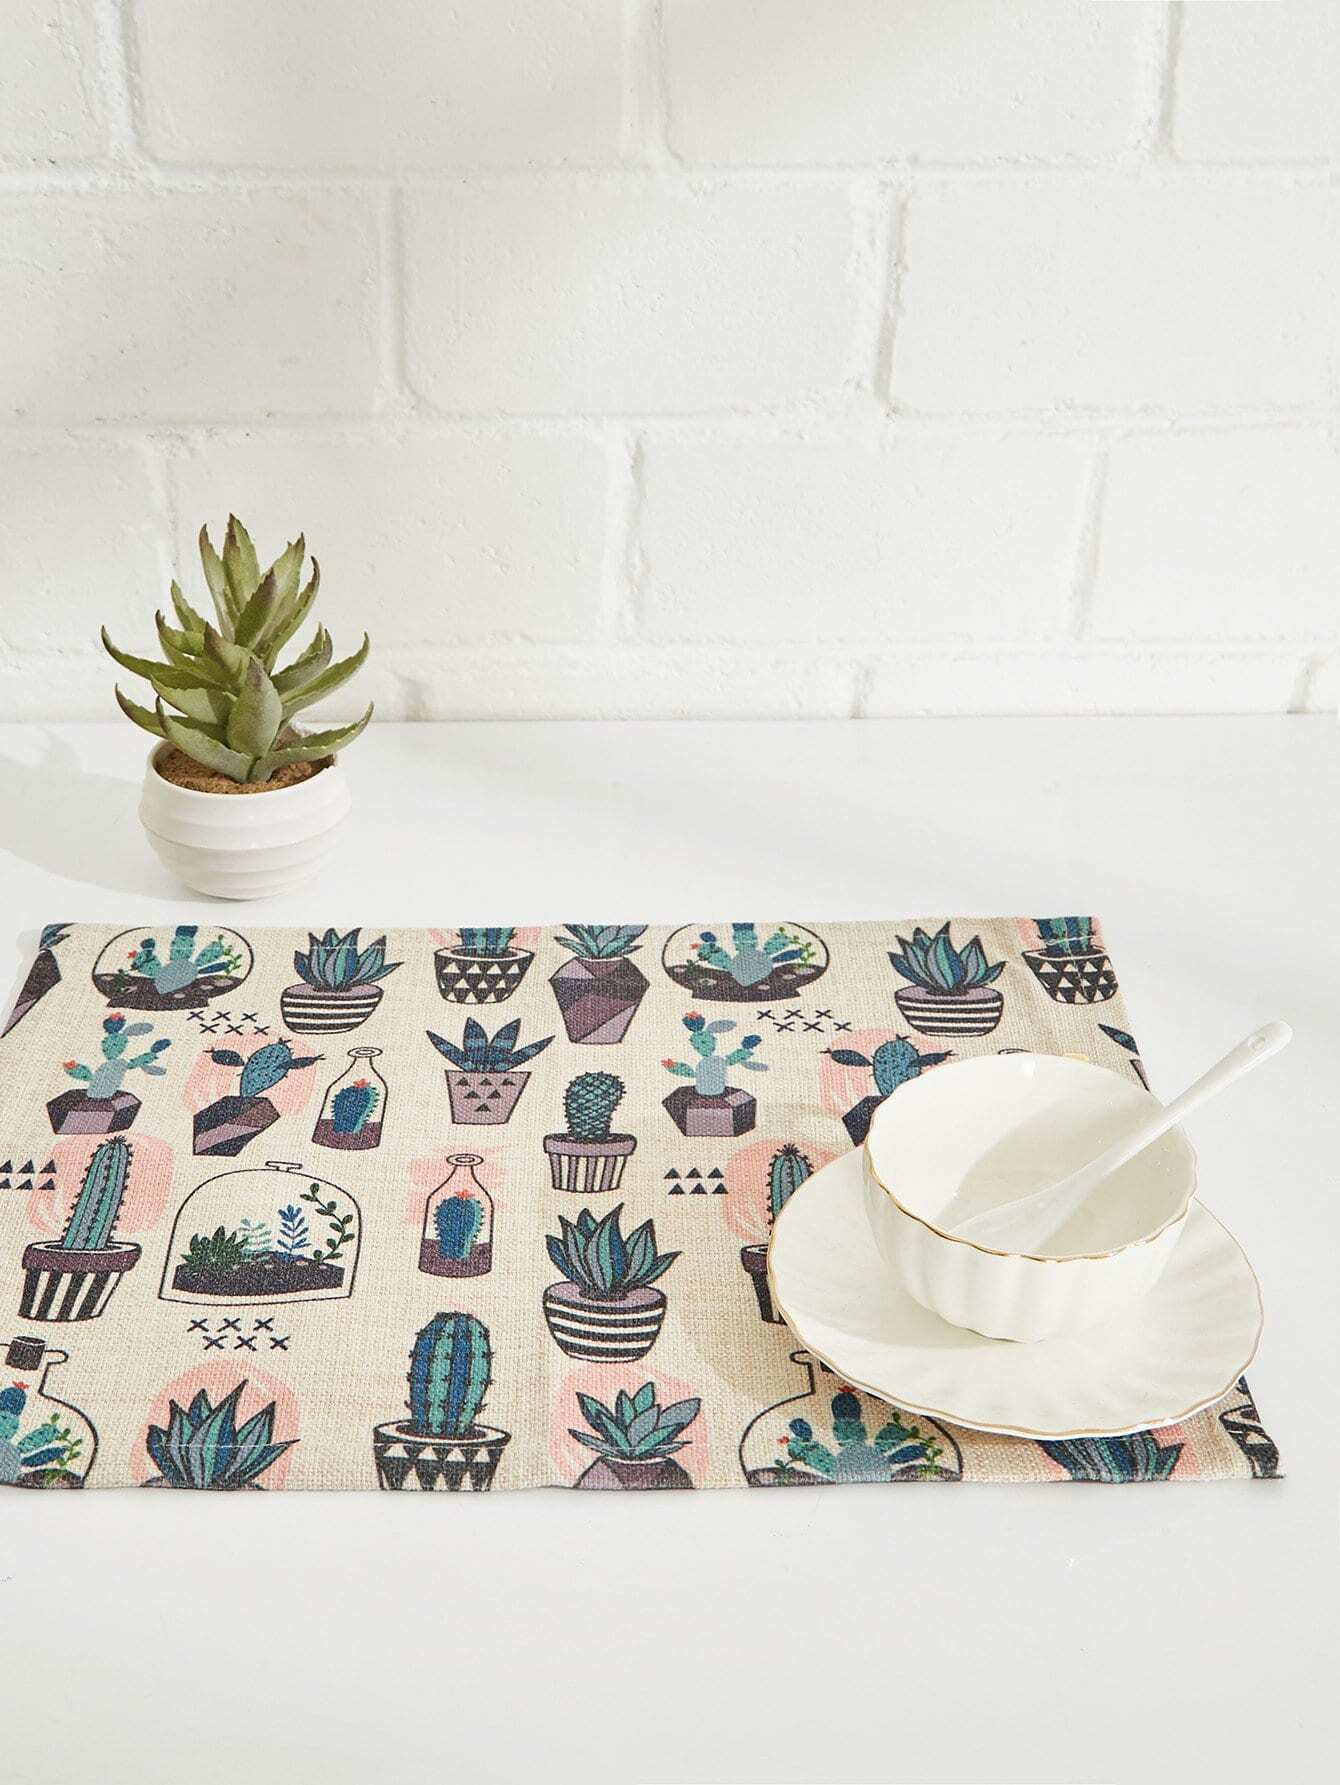 Cactus Overlay Linen Placement flamingo linen placement